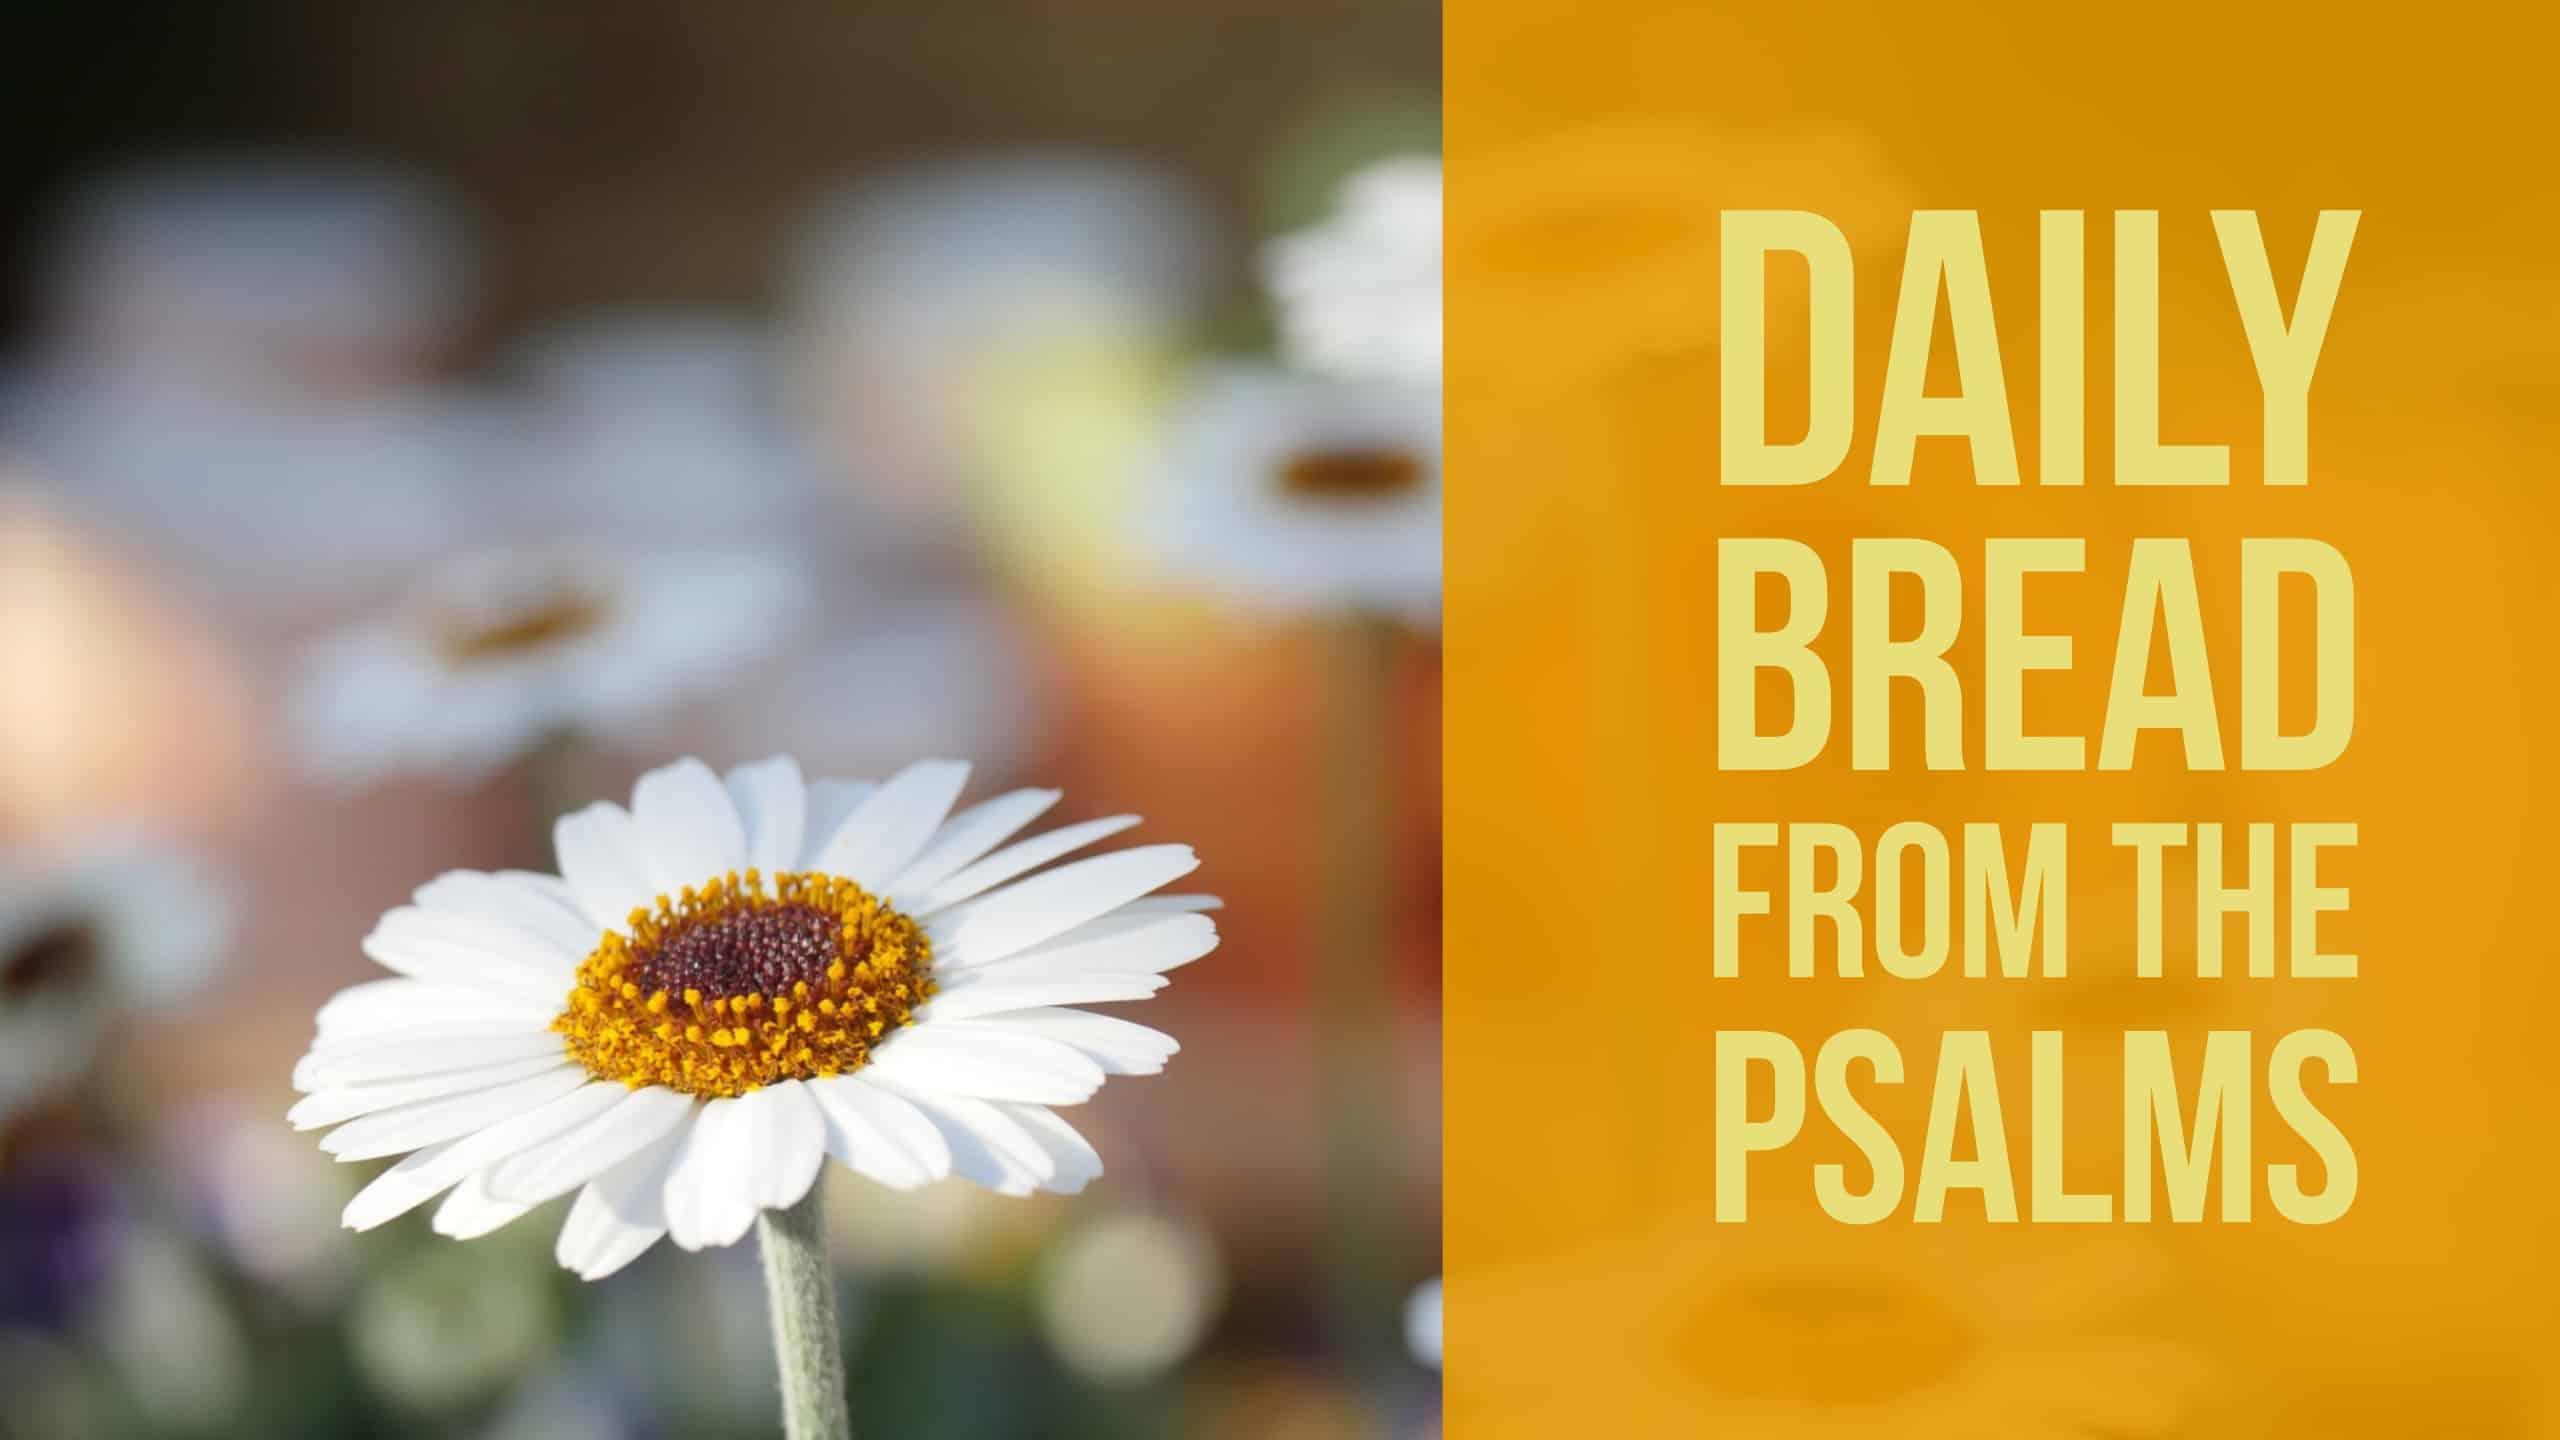 Psalm 11, Praying the Psalms (Fields of Daisies)